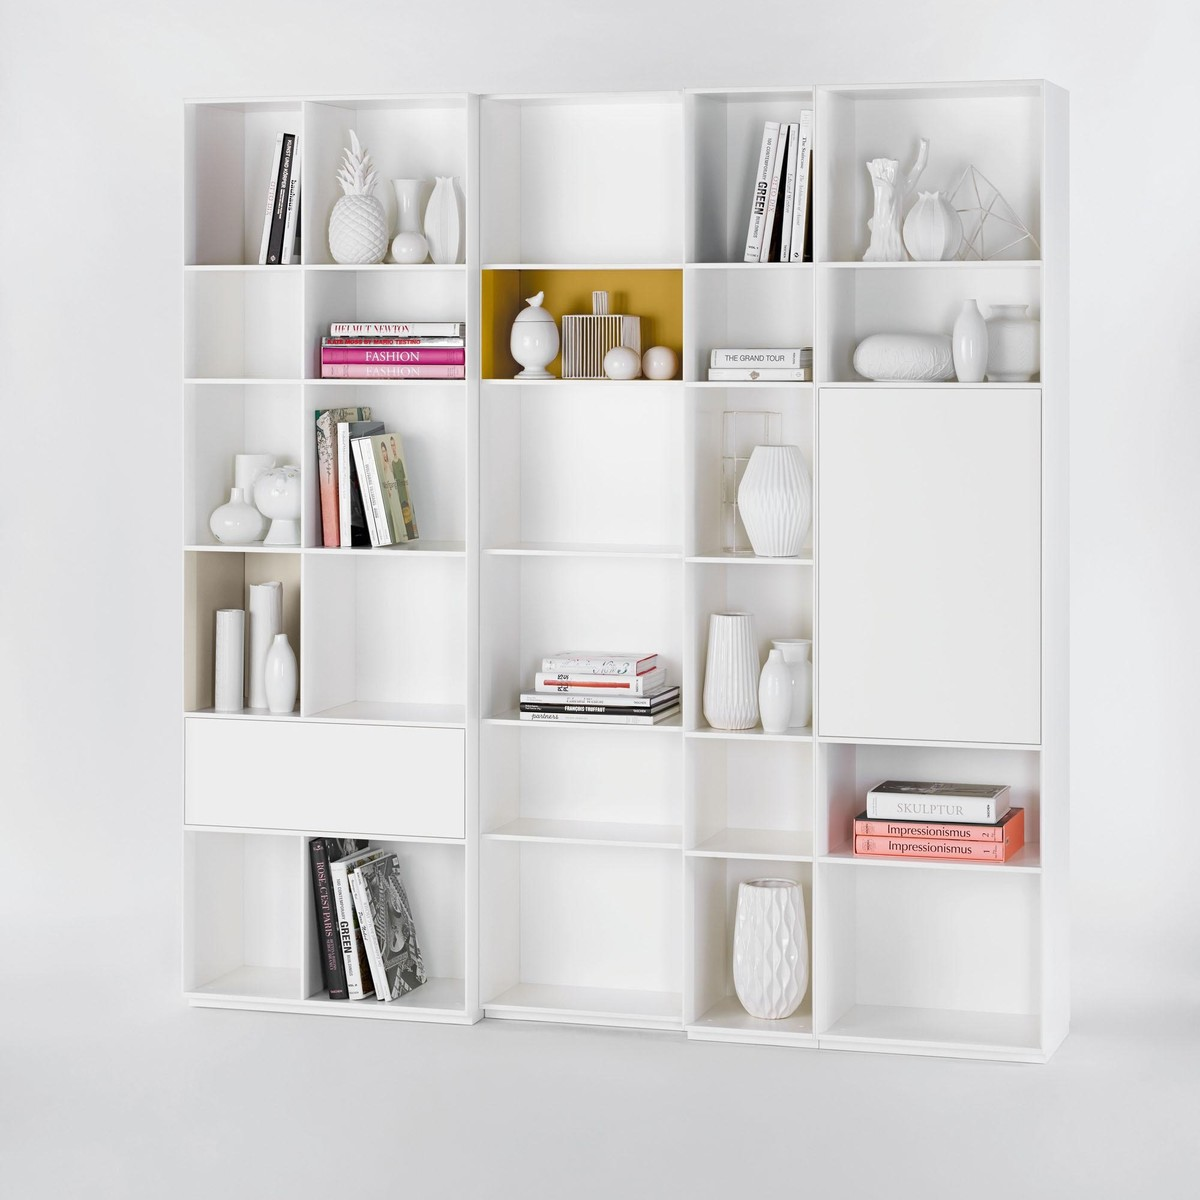 nex pur etag re avec porte piure. Black Bedroom Furniture Sets. Home Design Ideas